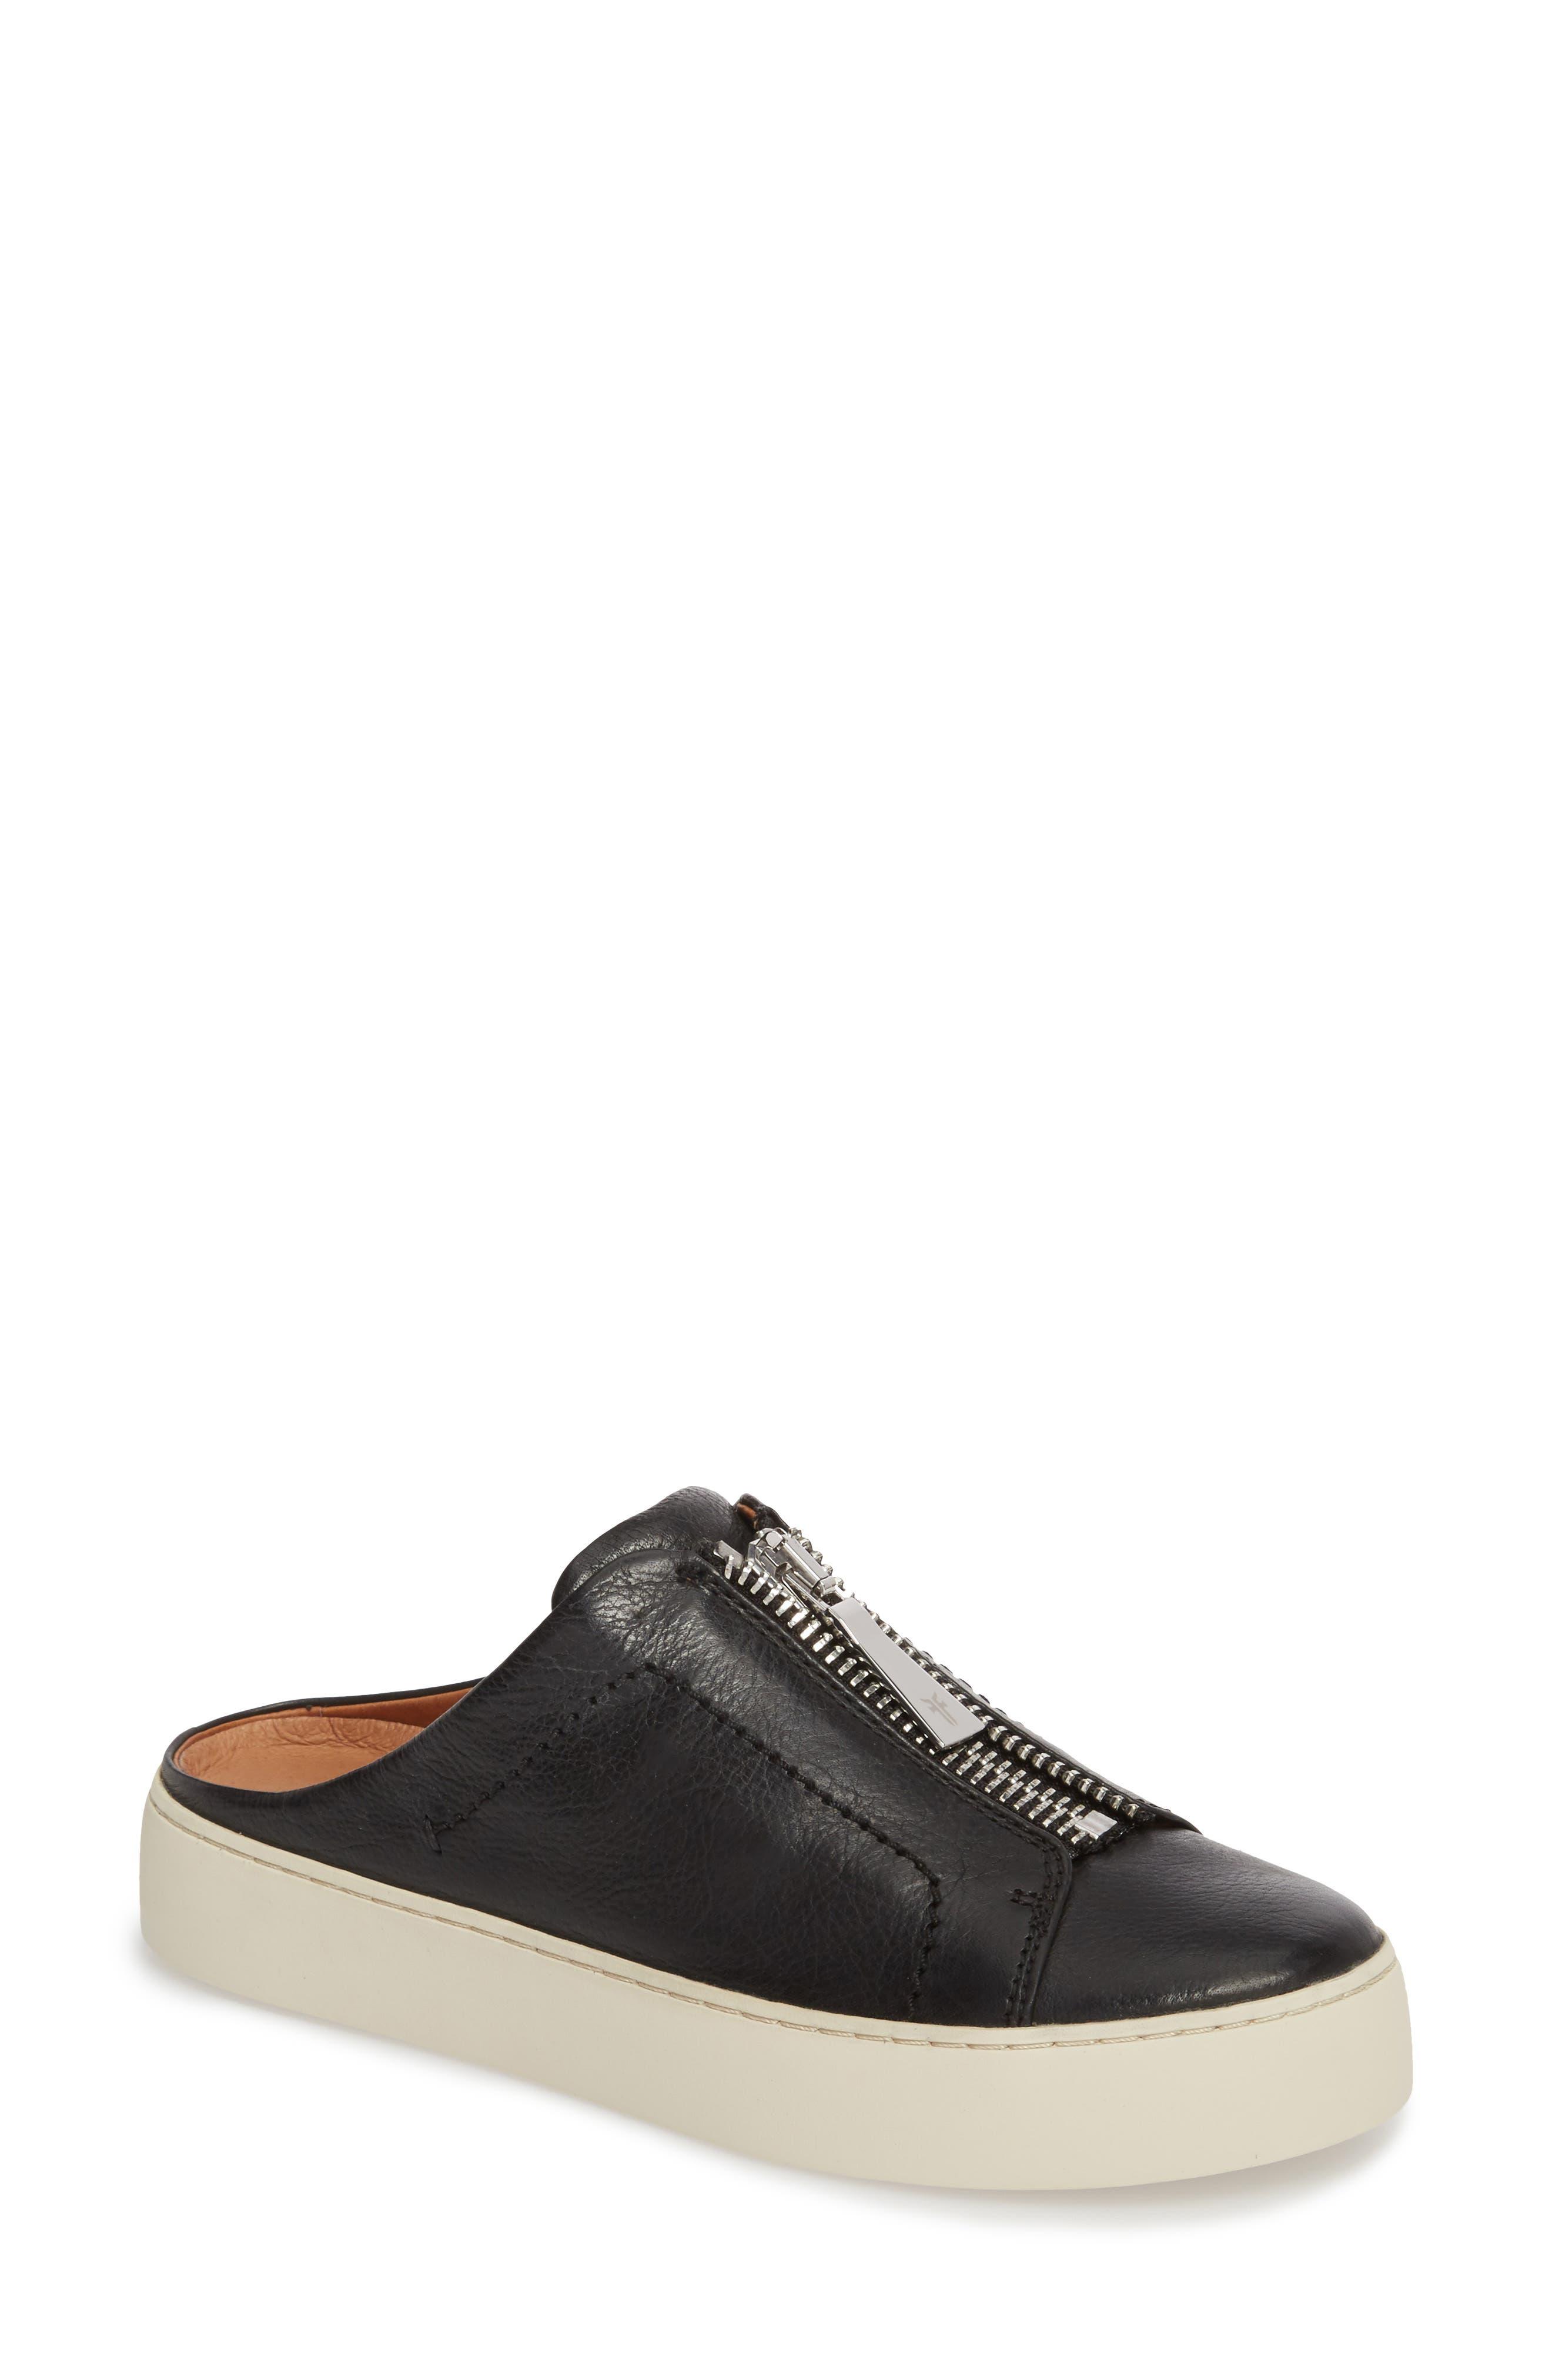 Lena Platform Sneaker Mule,                             Main thumbnail 1, color,                             001